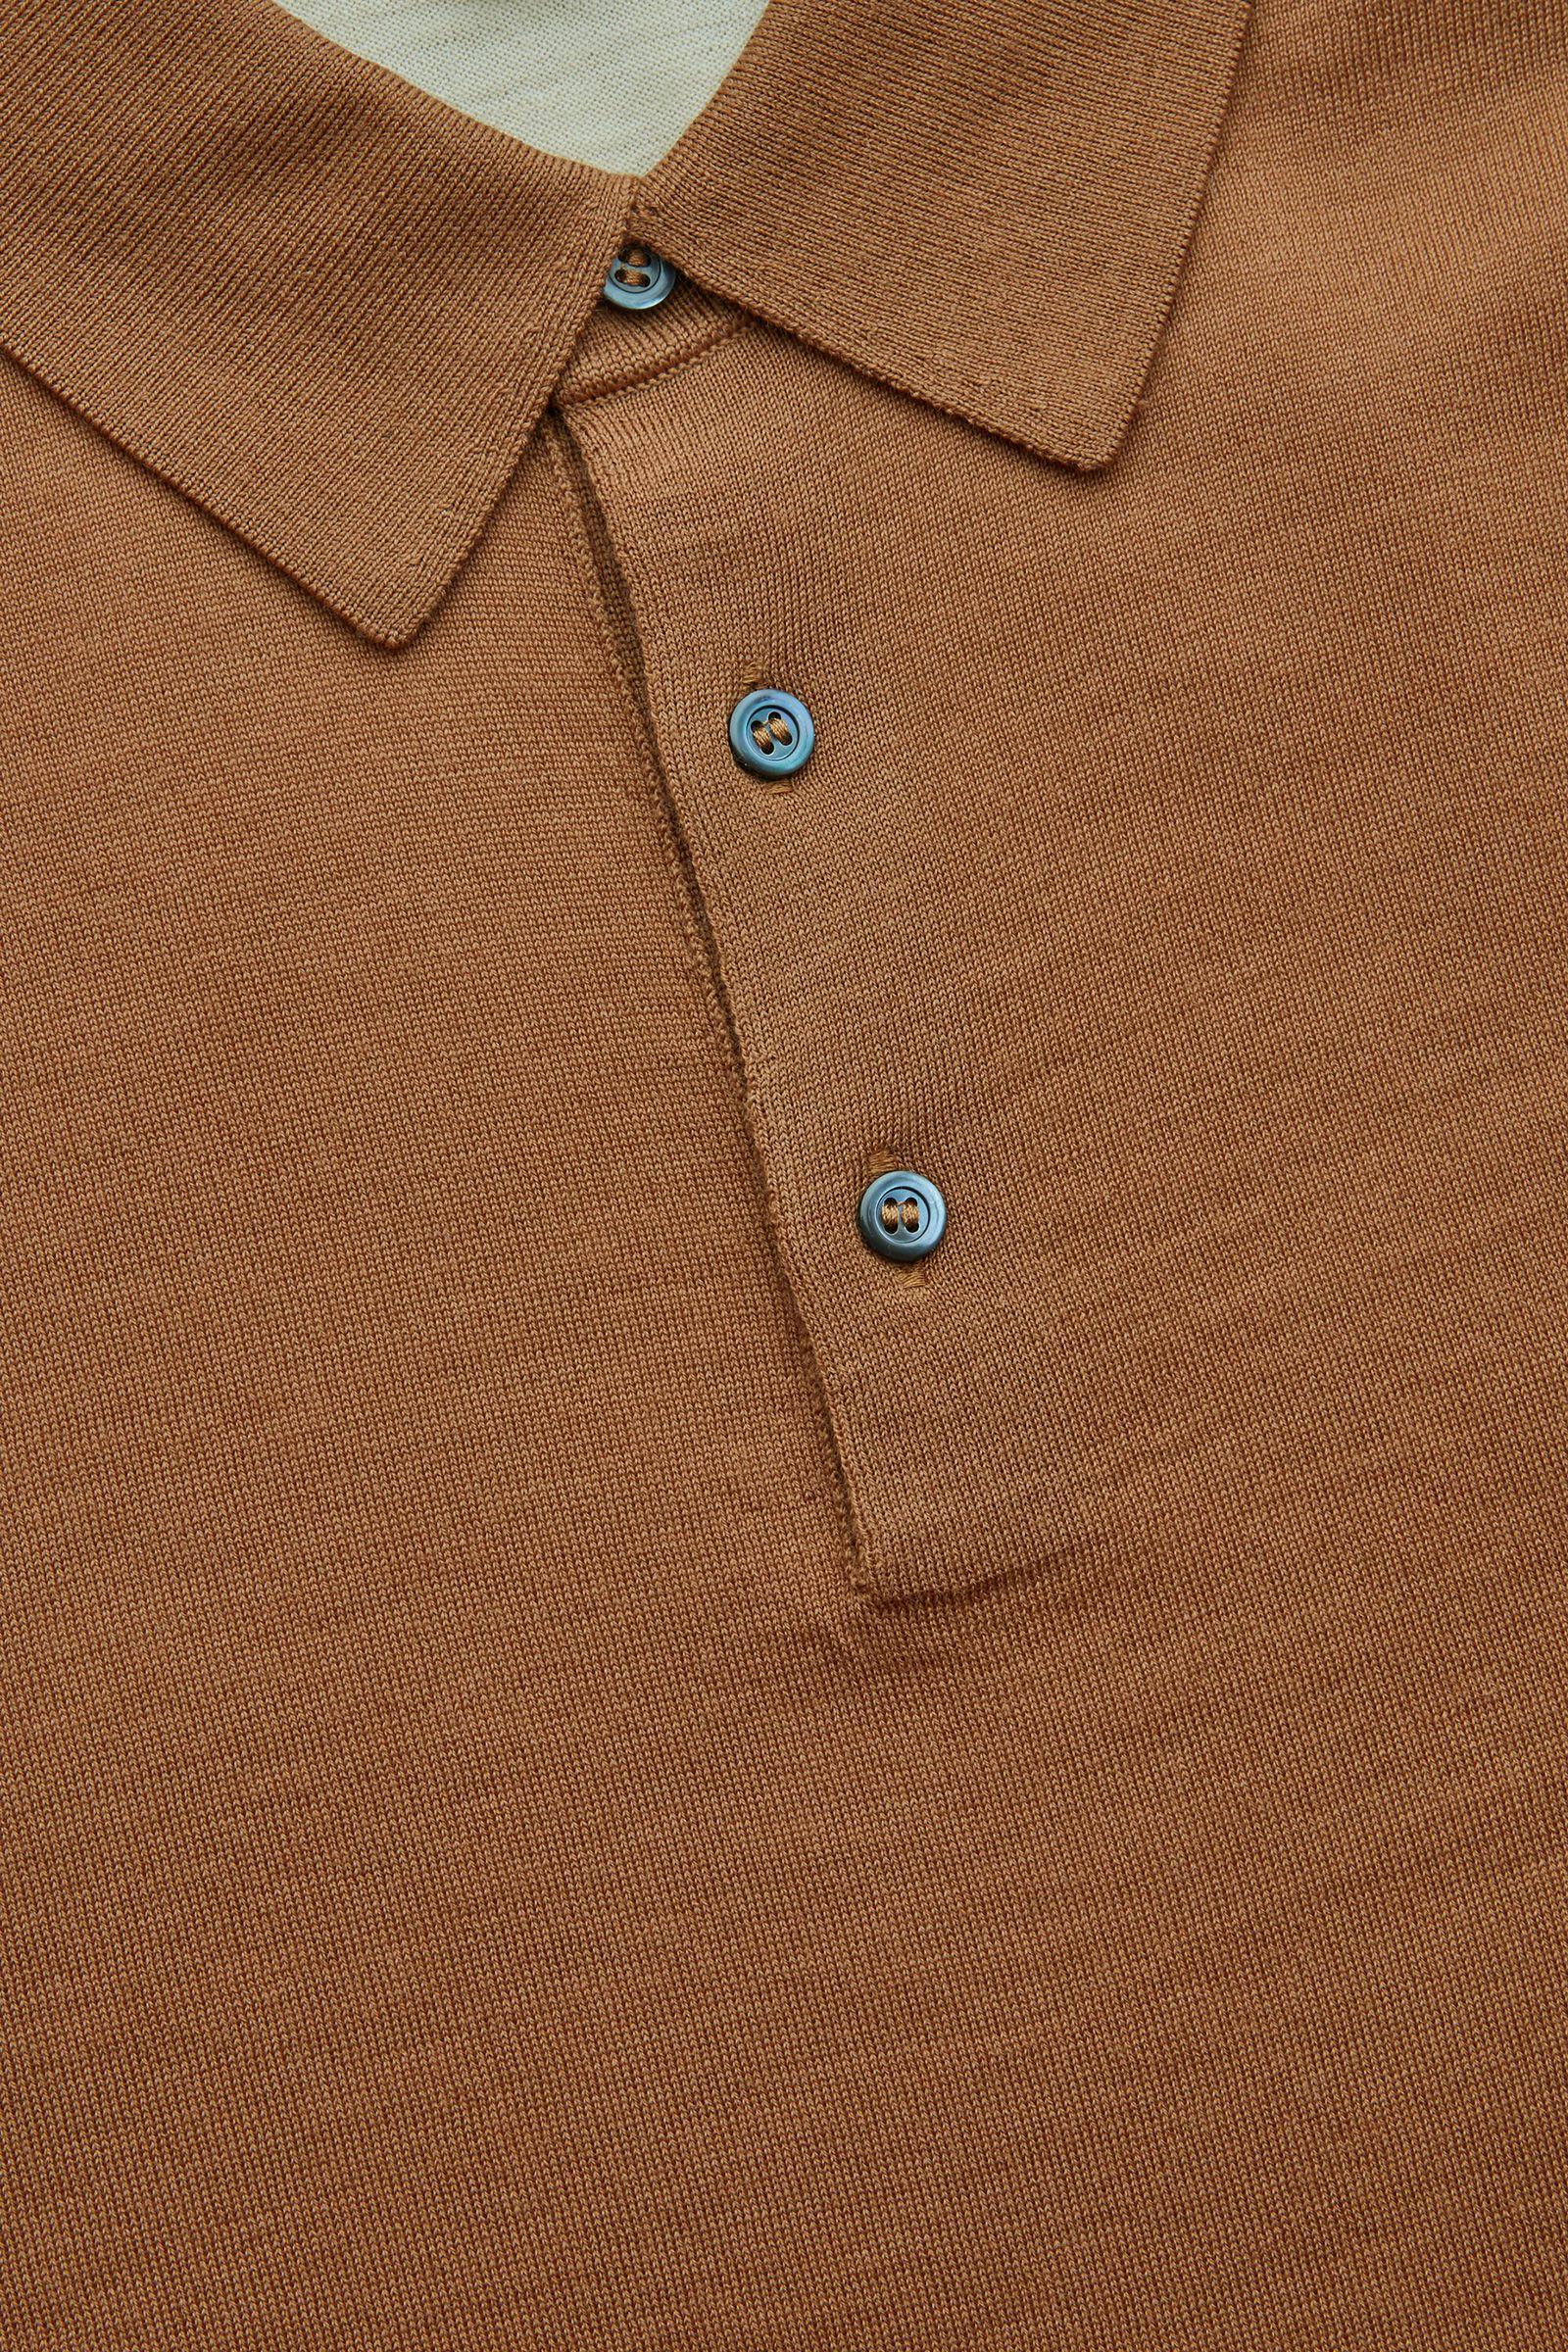 COS 롱 슬리브 메리노 폴로 셔츠의 베이지컬러 Detail입니다.